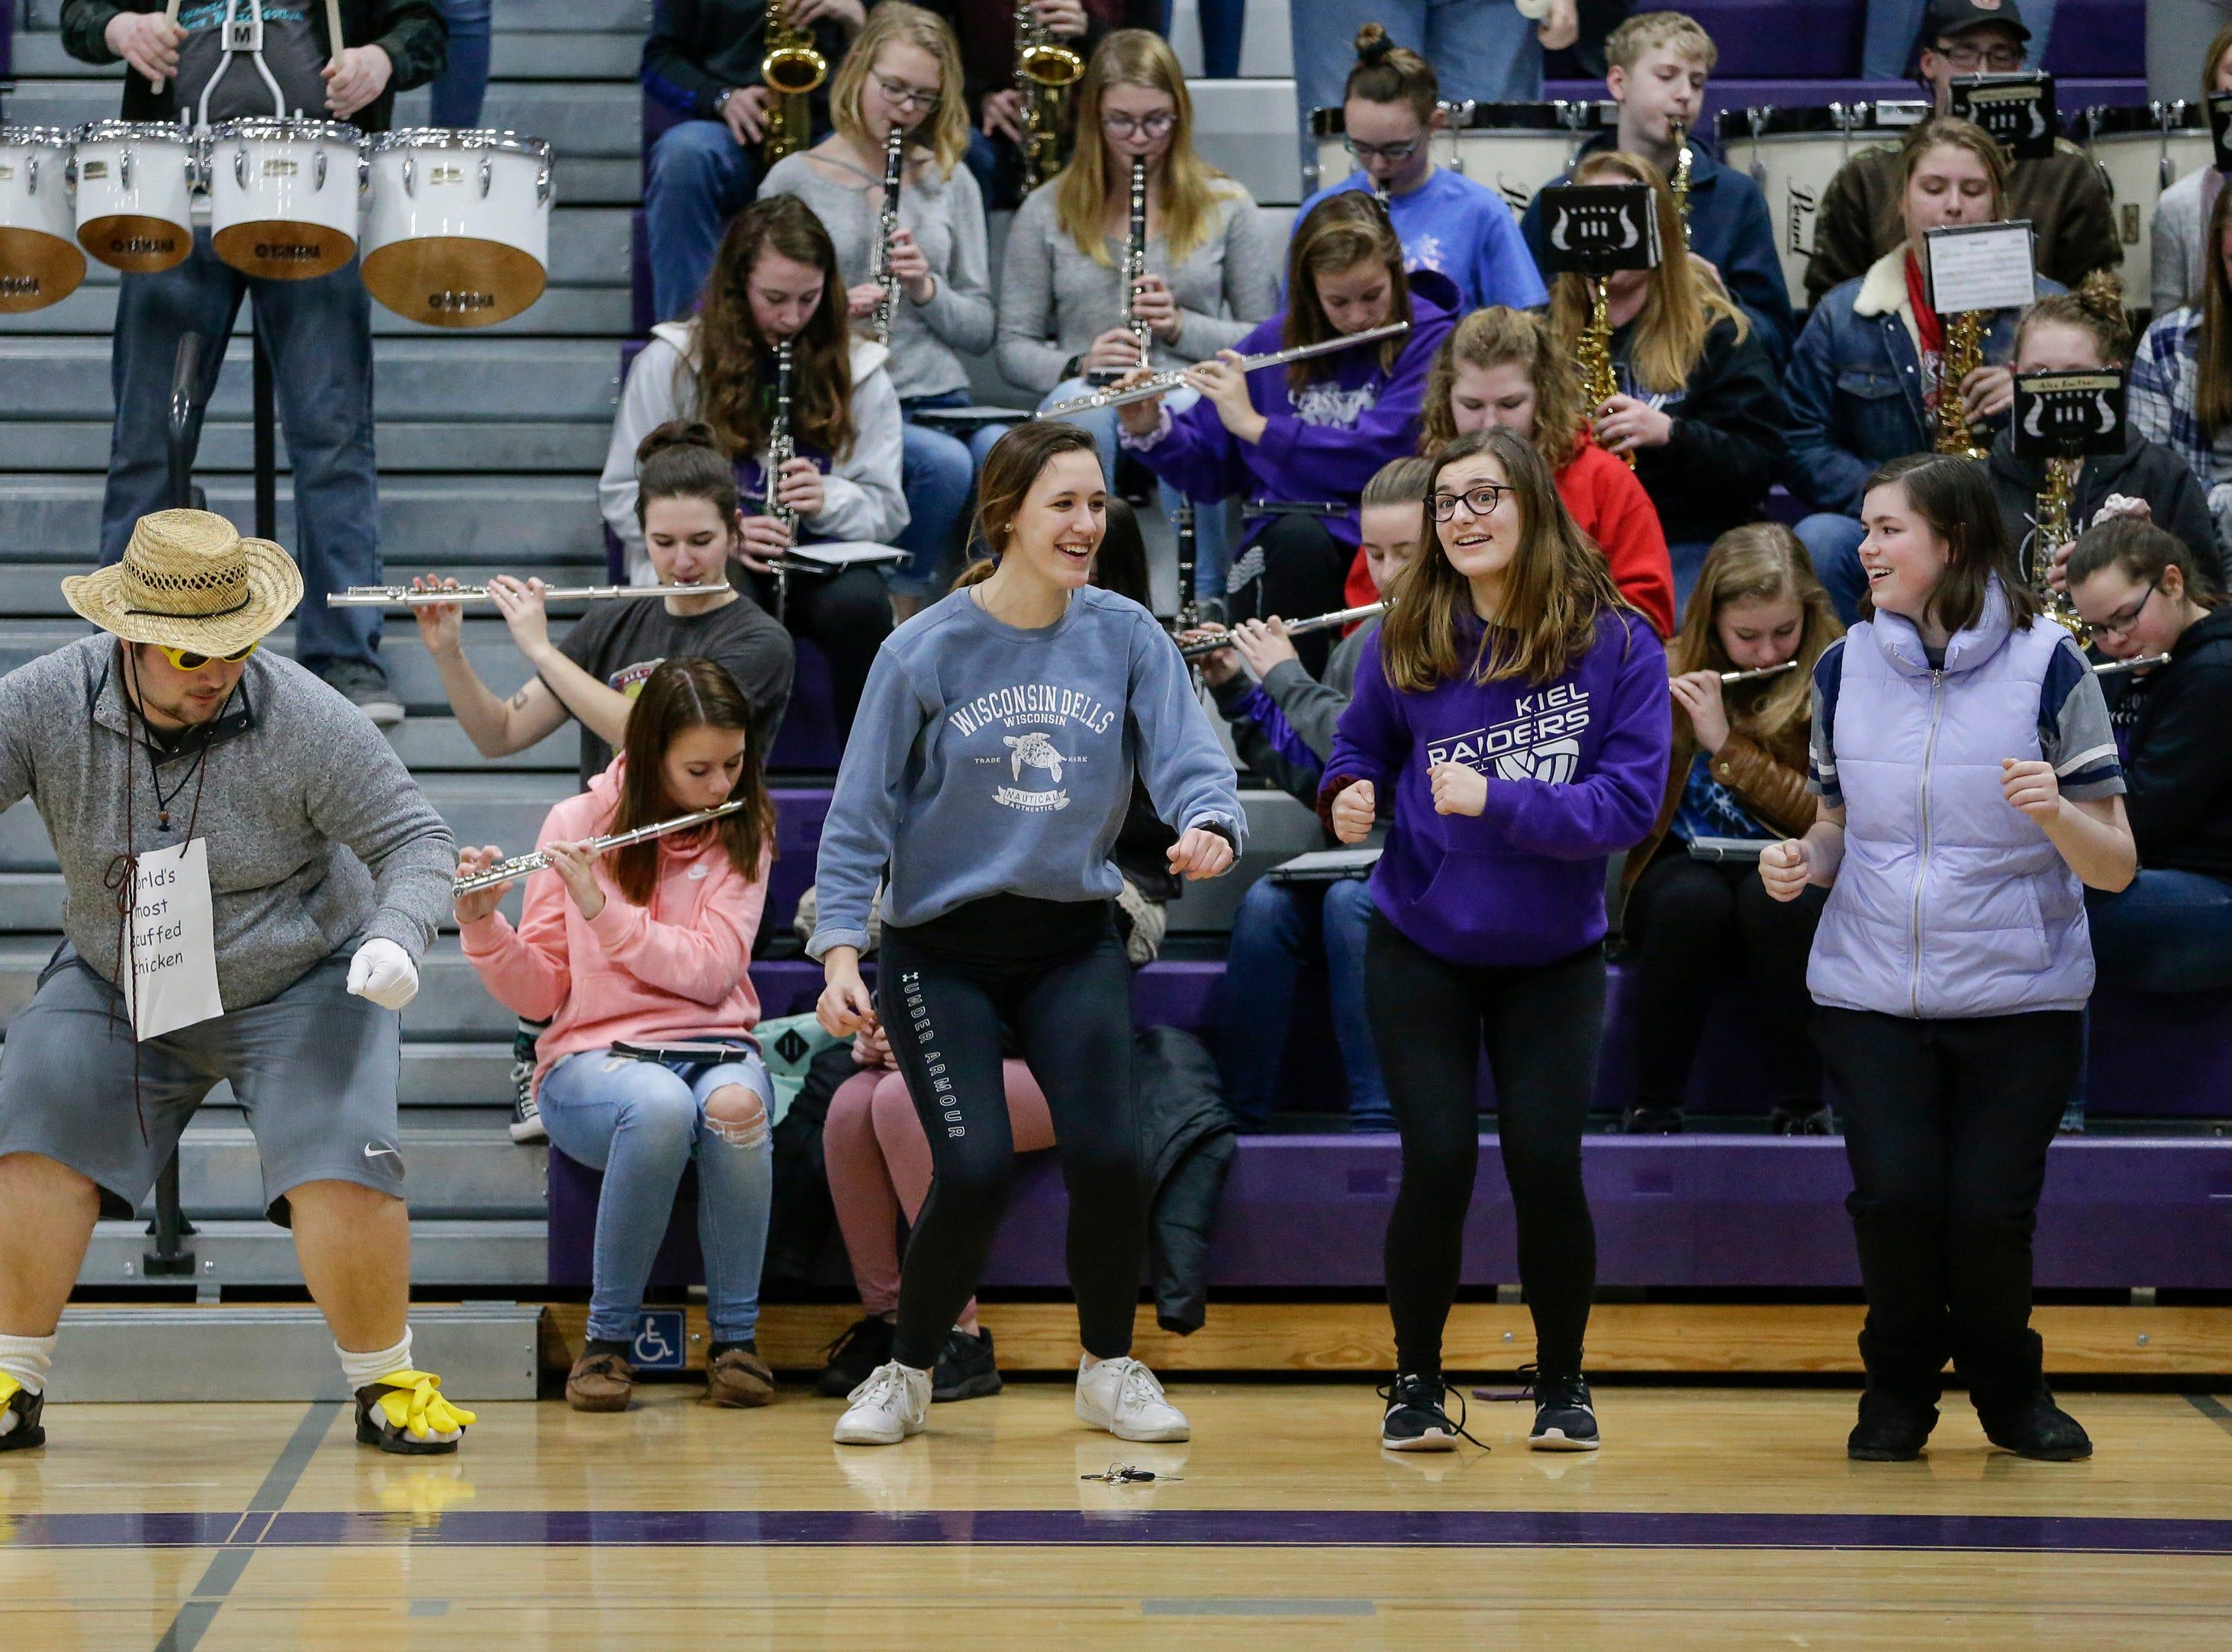 Kiel band members do the chicken dance before a girls basketball EWC matchup against Roncalli at Kiel High School Thursday, January 17, 2019, in Kiel, Wis. Joshua Clark/USA TODAY NETWORK-Wisconsin